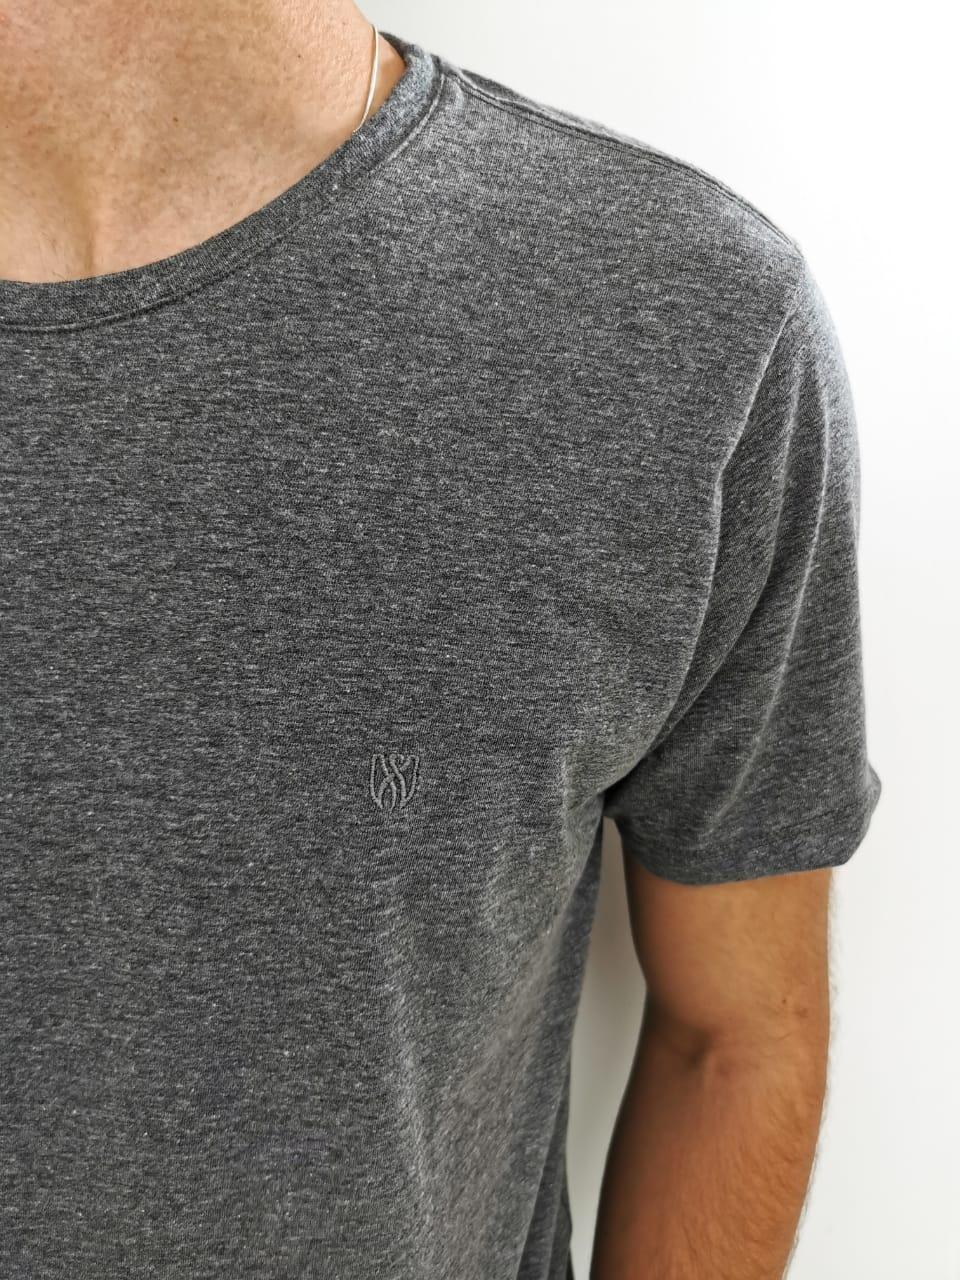 Camiseta Básica Lozemar Cinza Mescla Escura